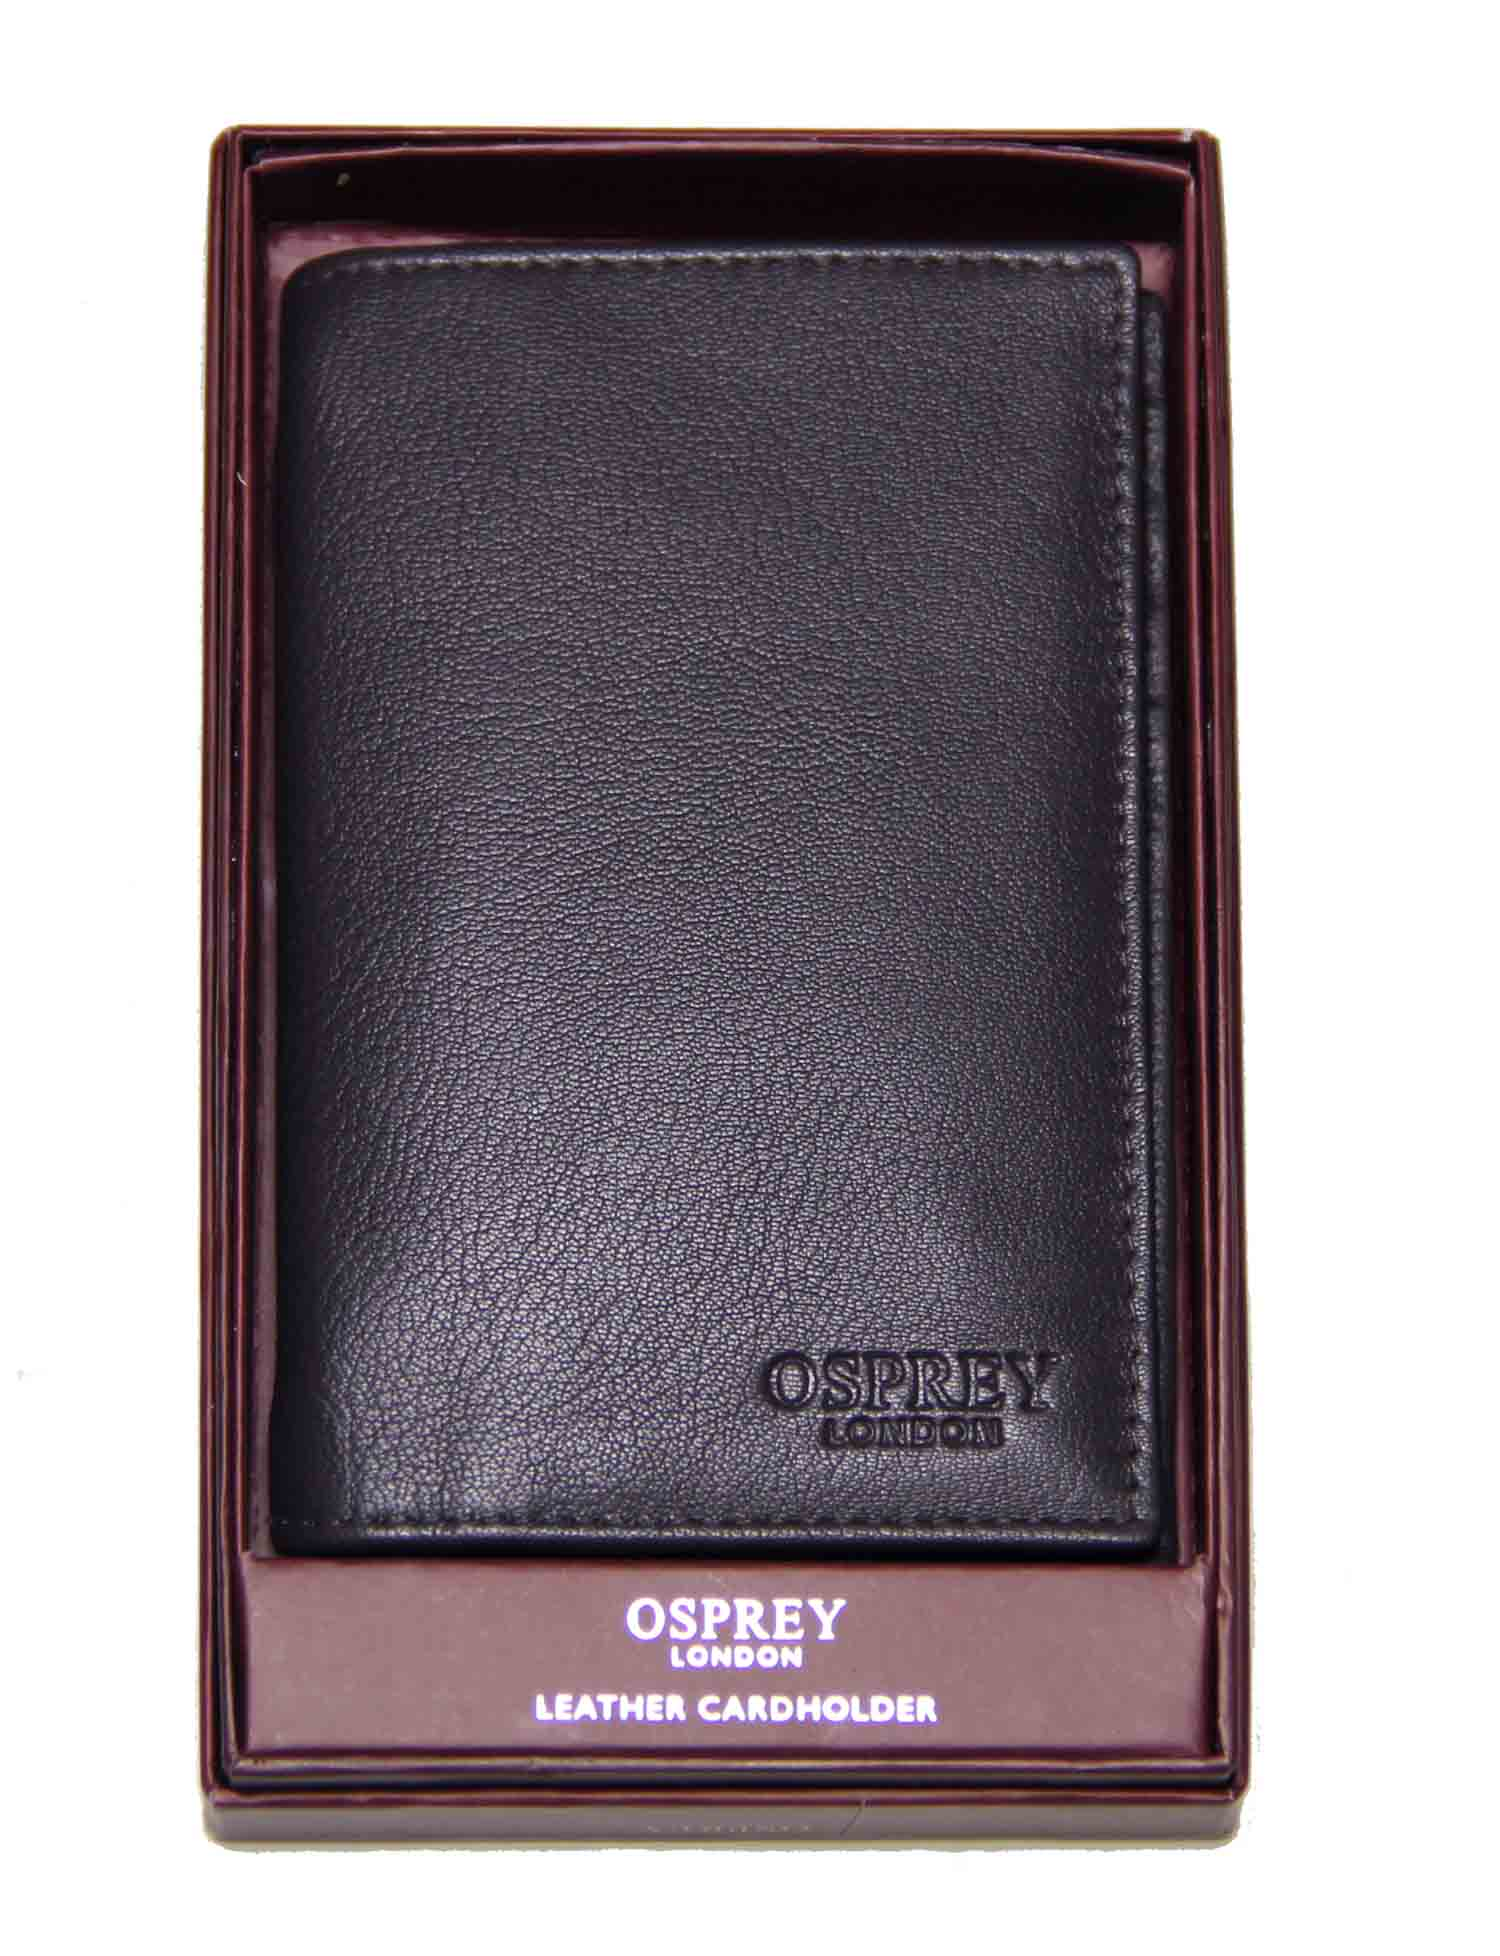 Osprey London Credit Card Wallet Chocolate Brown Goat Skin Leather Men's